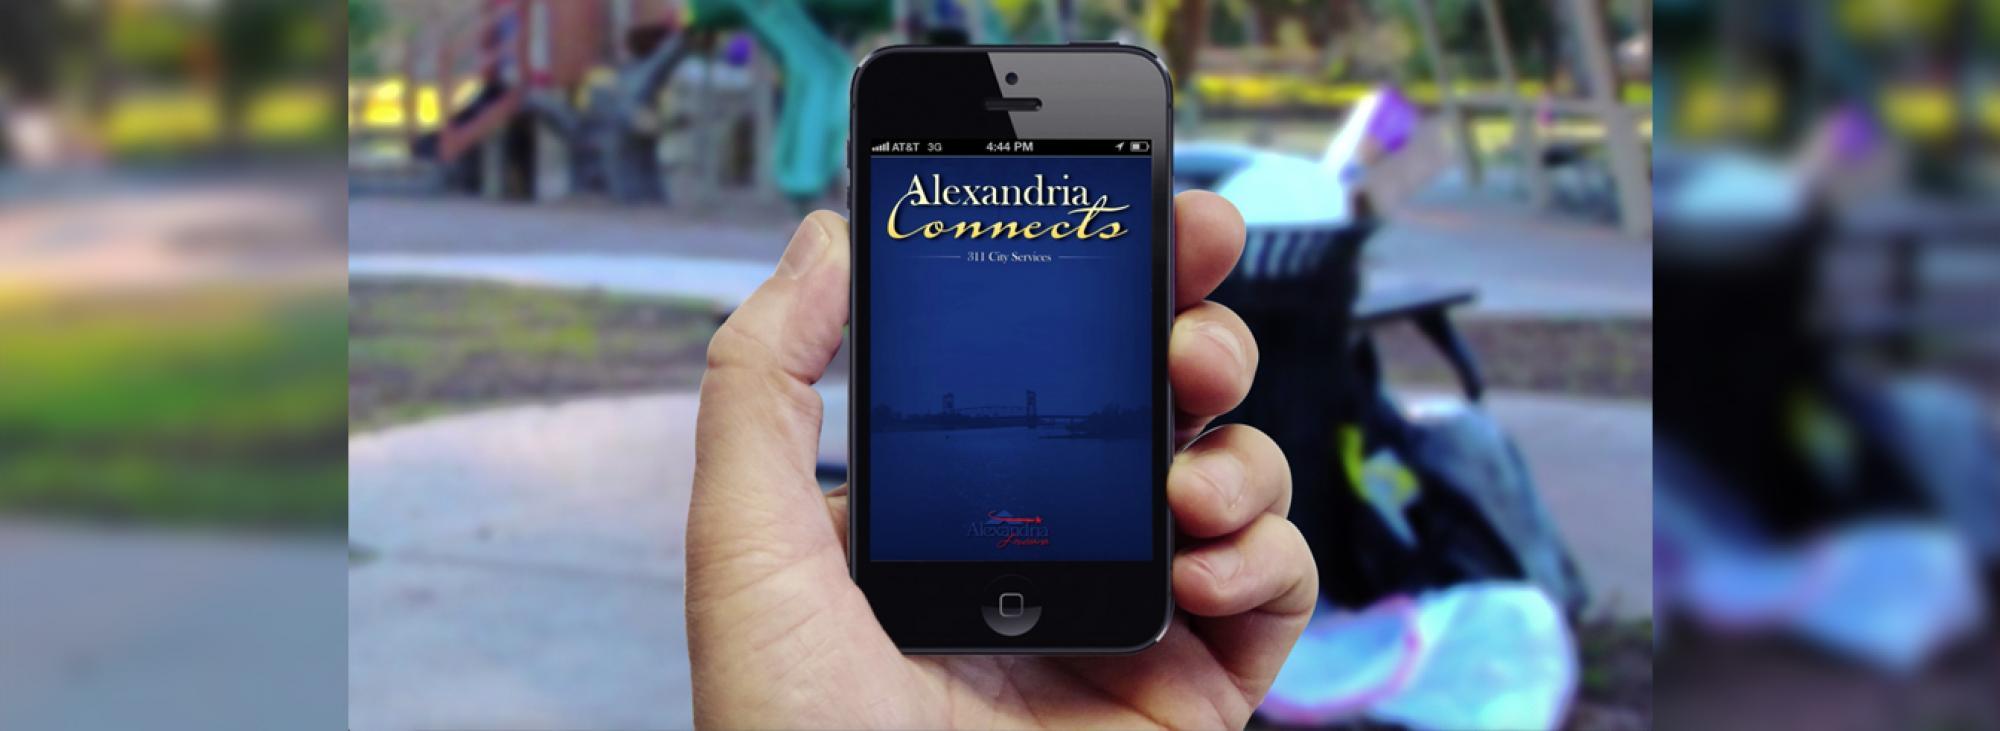 Alexandria Connects app - City of Alexandria, LA mayor